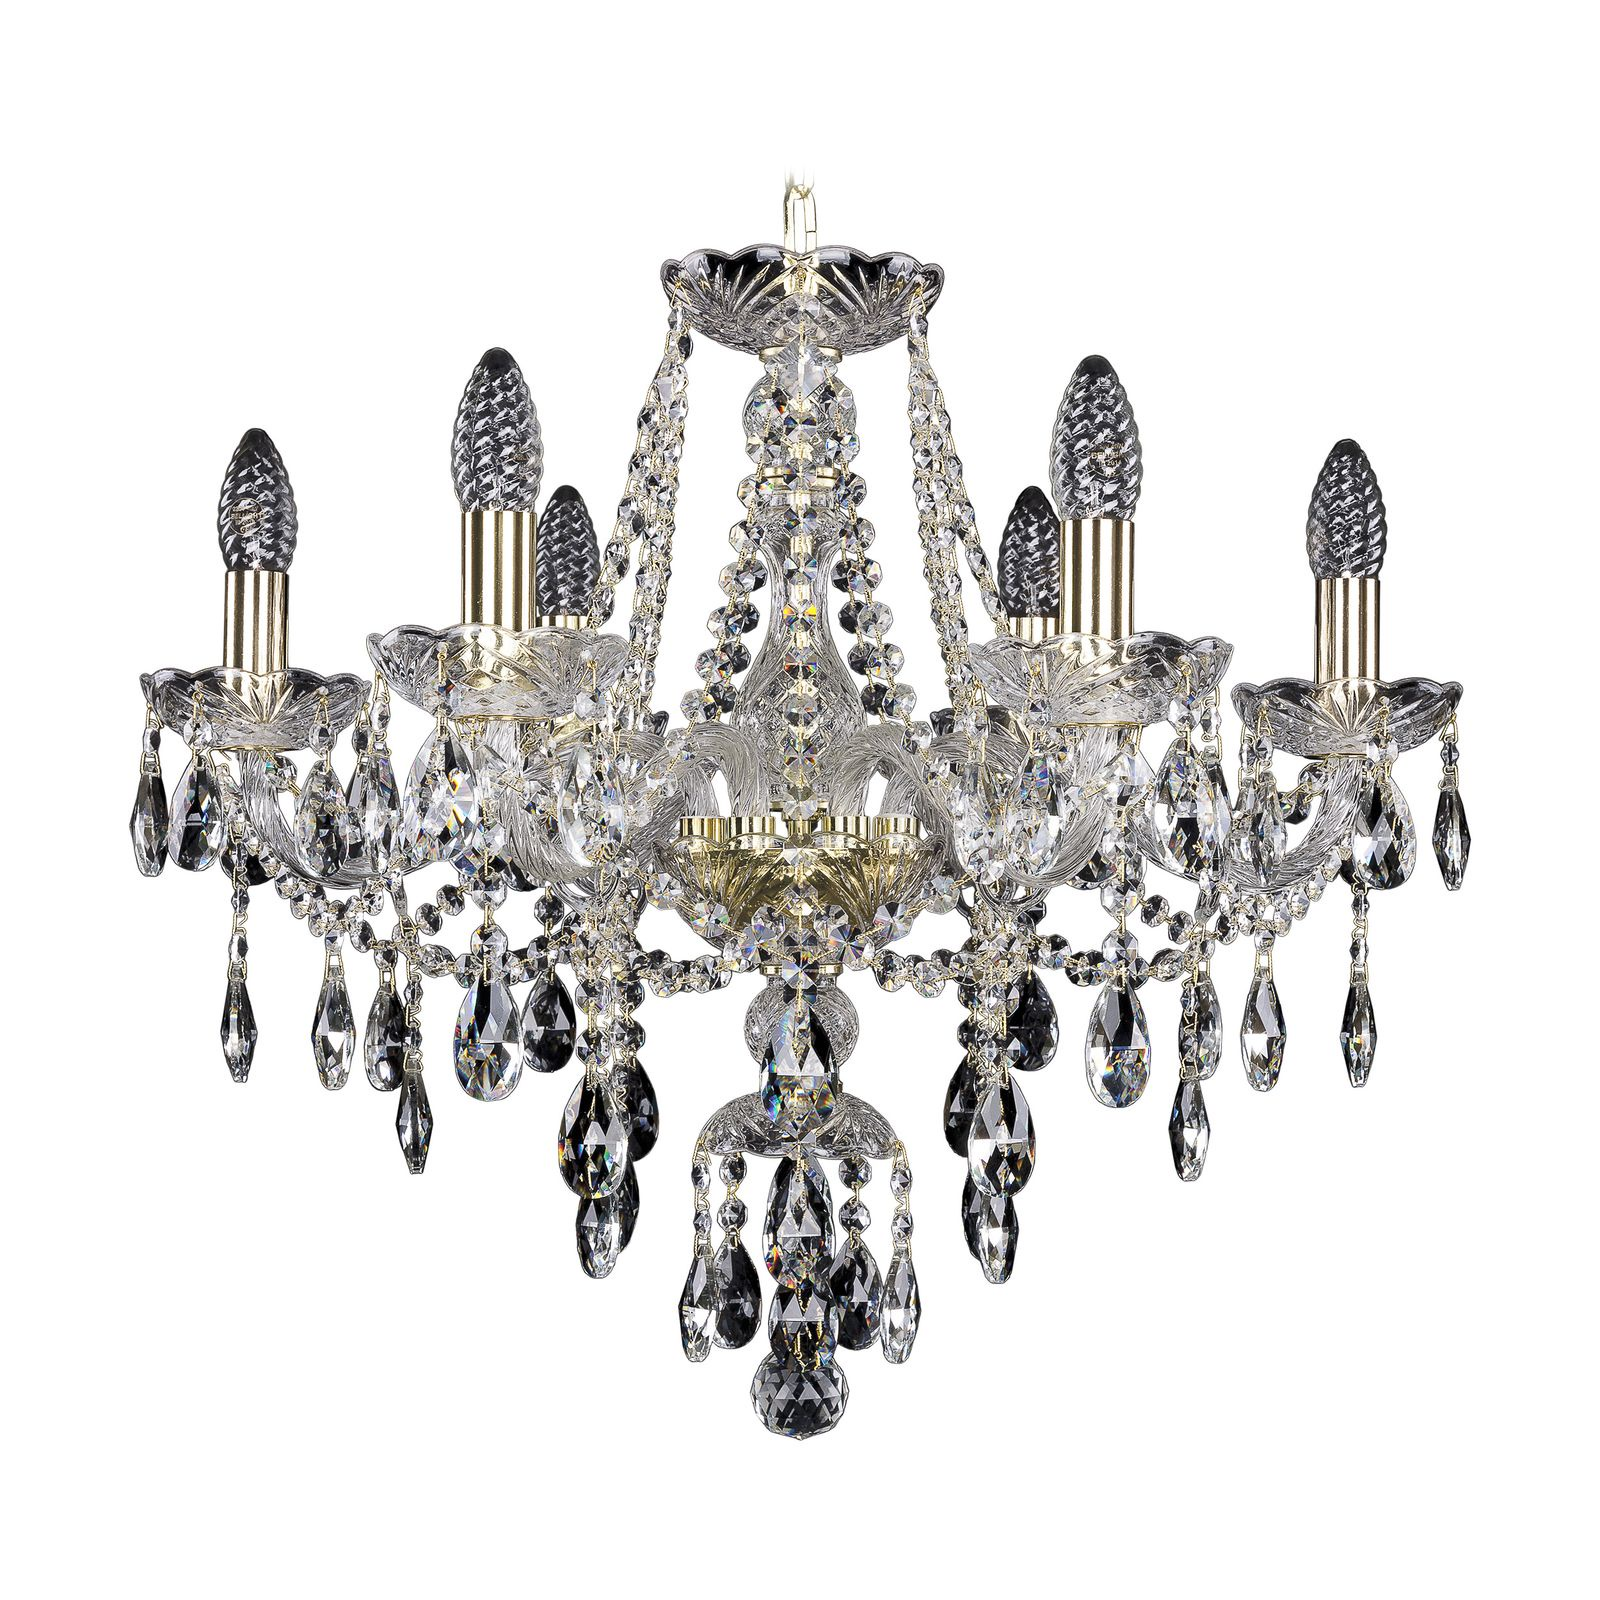 Потолочный светильник Bohemia Ivele Crystal 1415/8/141 G, E14, 40 Вт bohemia ivele crystal 1932 75z g